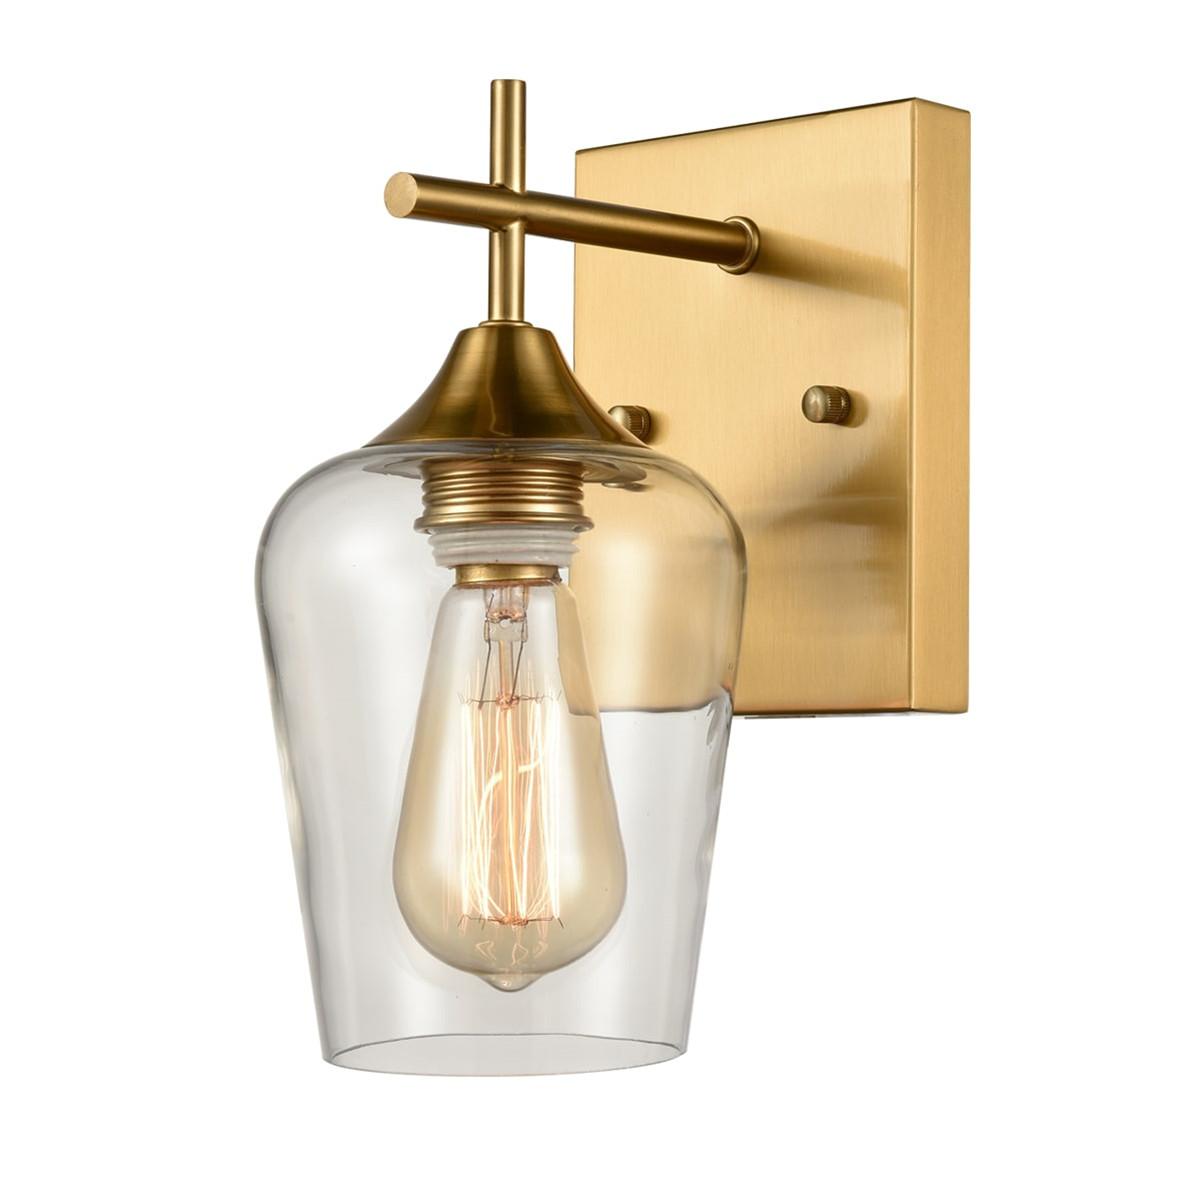 Modern Clear Glass Wall Sconces Brass Bathroom Wall Lights 8888